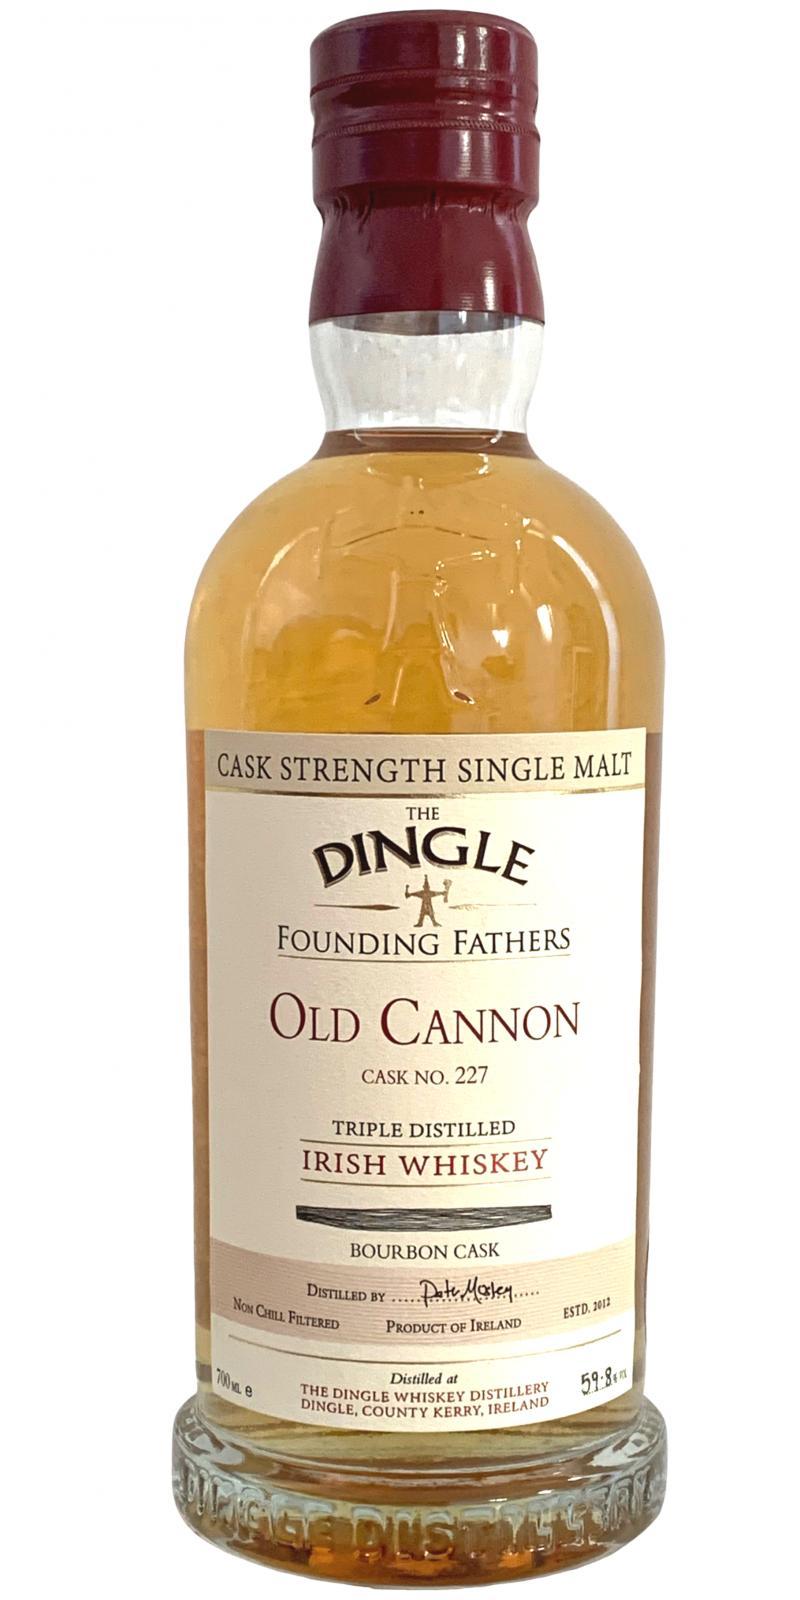 Dingle Old Cannon